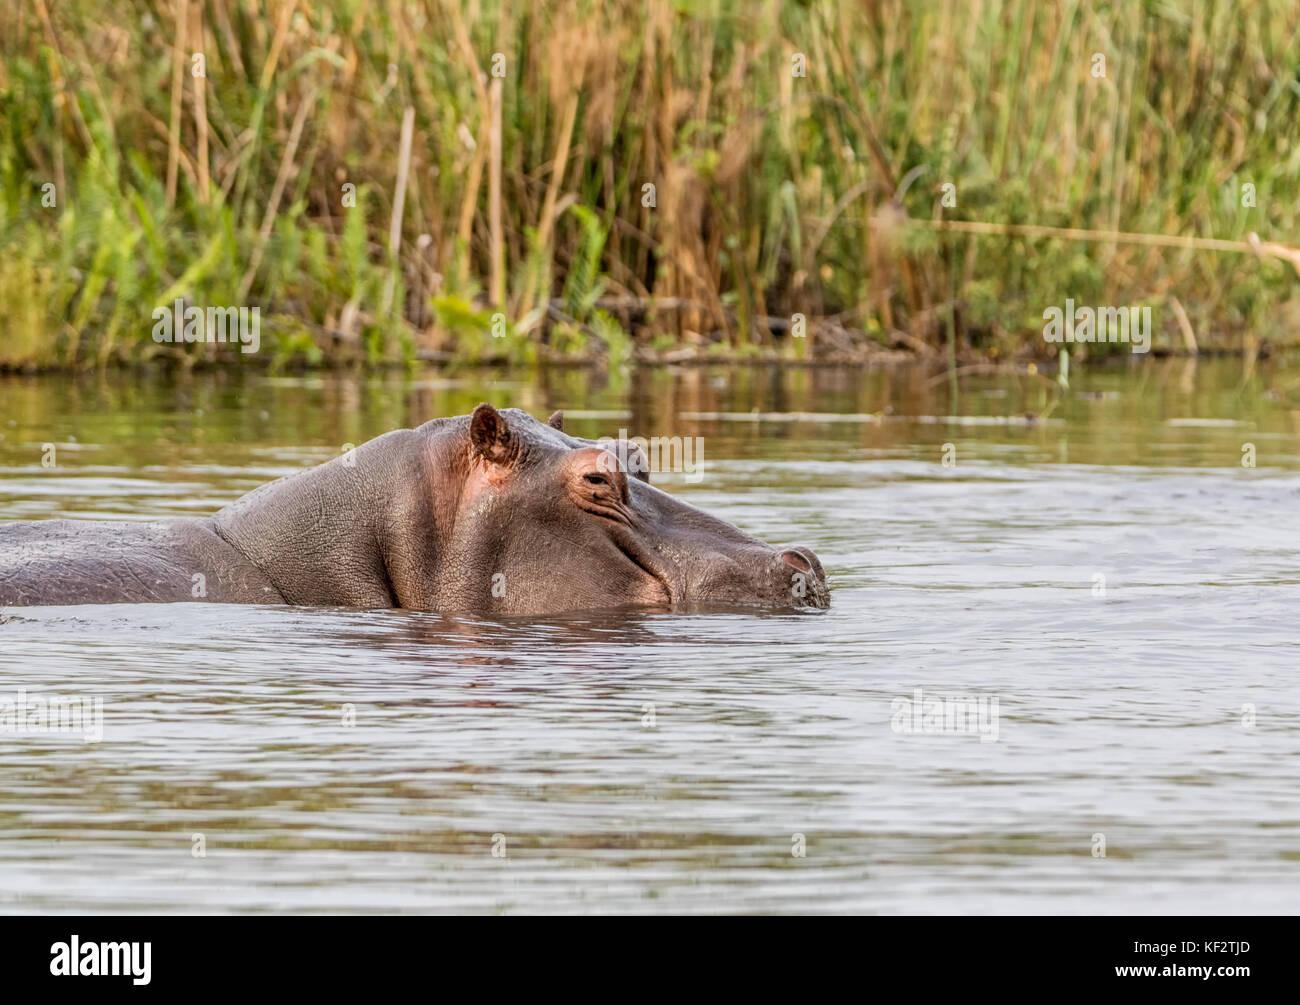 Hippo in a river in the Caprivi Strip, Namibia Stock Photo